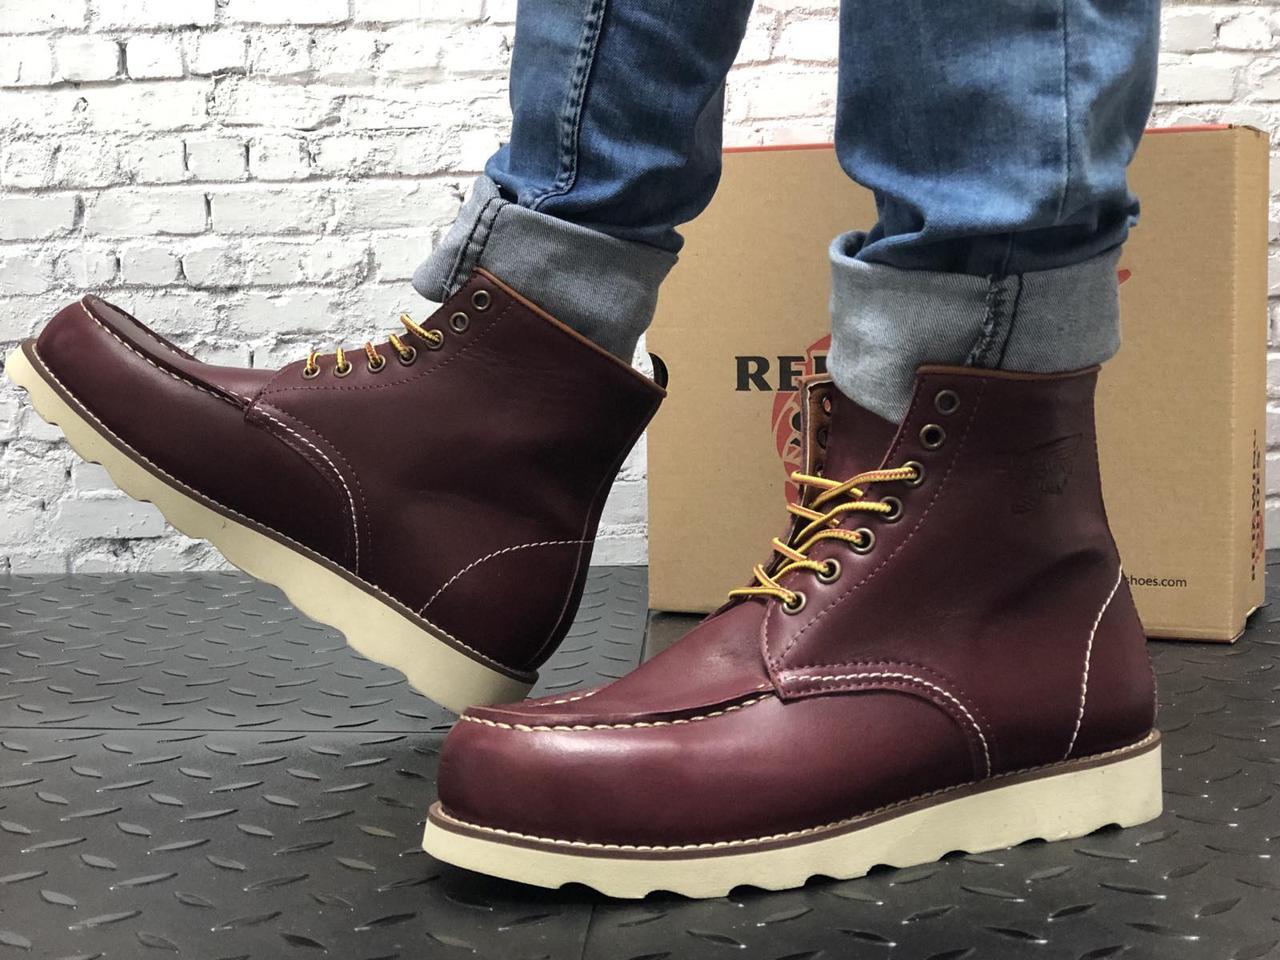 Мужские ботинки Red Wing в стиле Ред Вингс (Реплика ААА+)